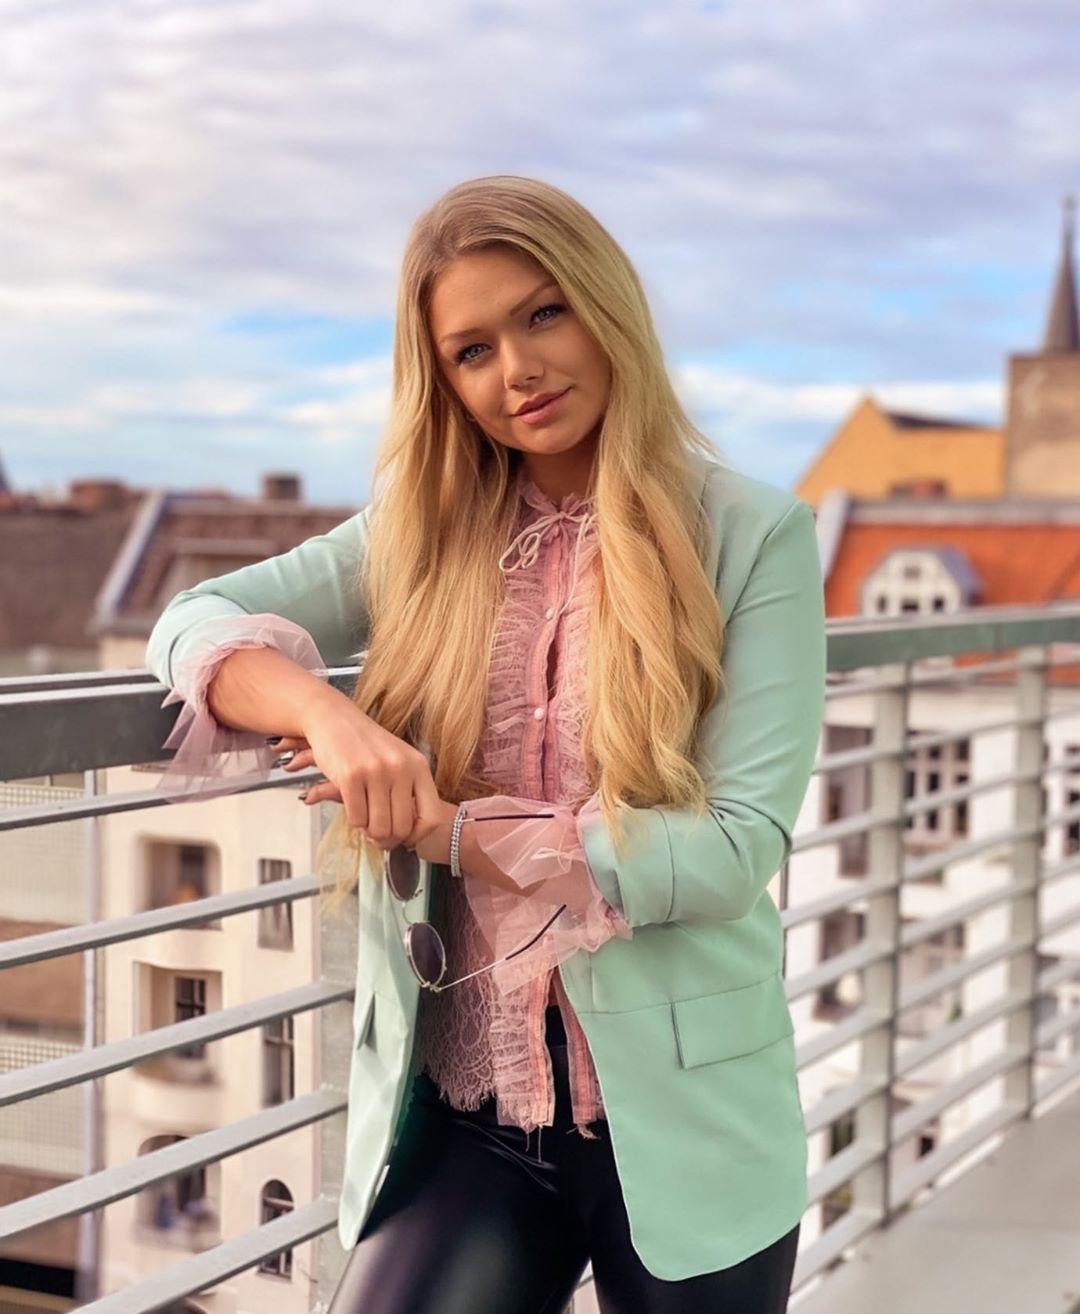 Sarah-Wiese-Wallpapers-Insta-Fit-Bio-2